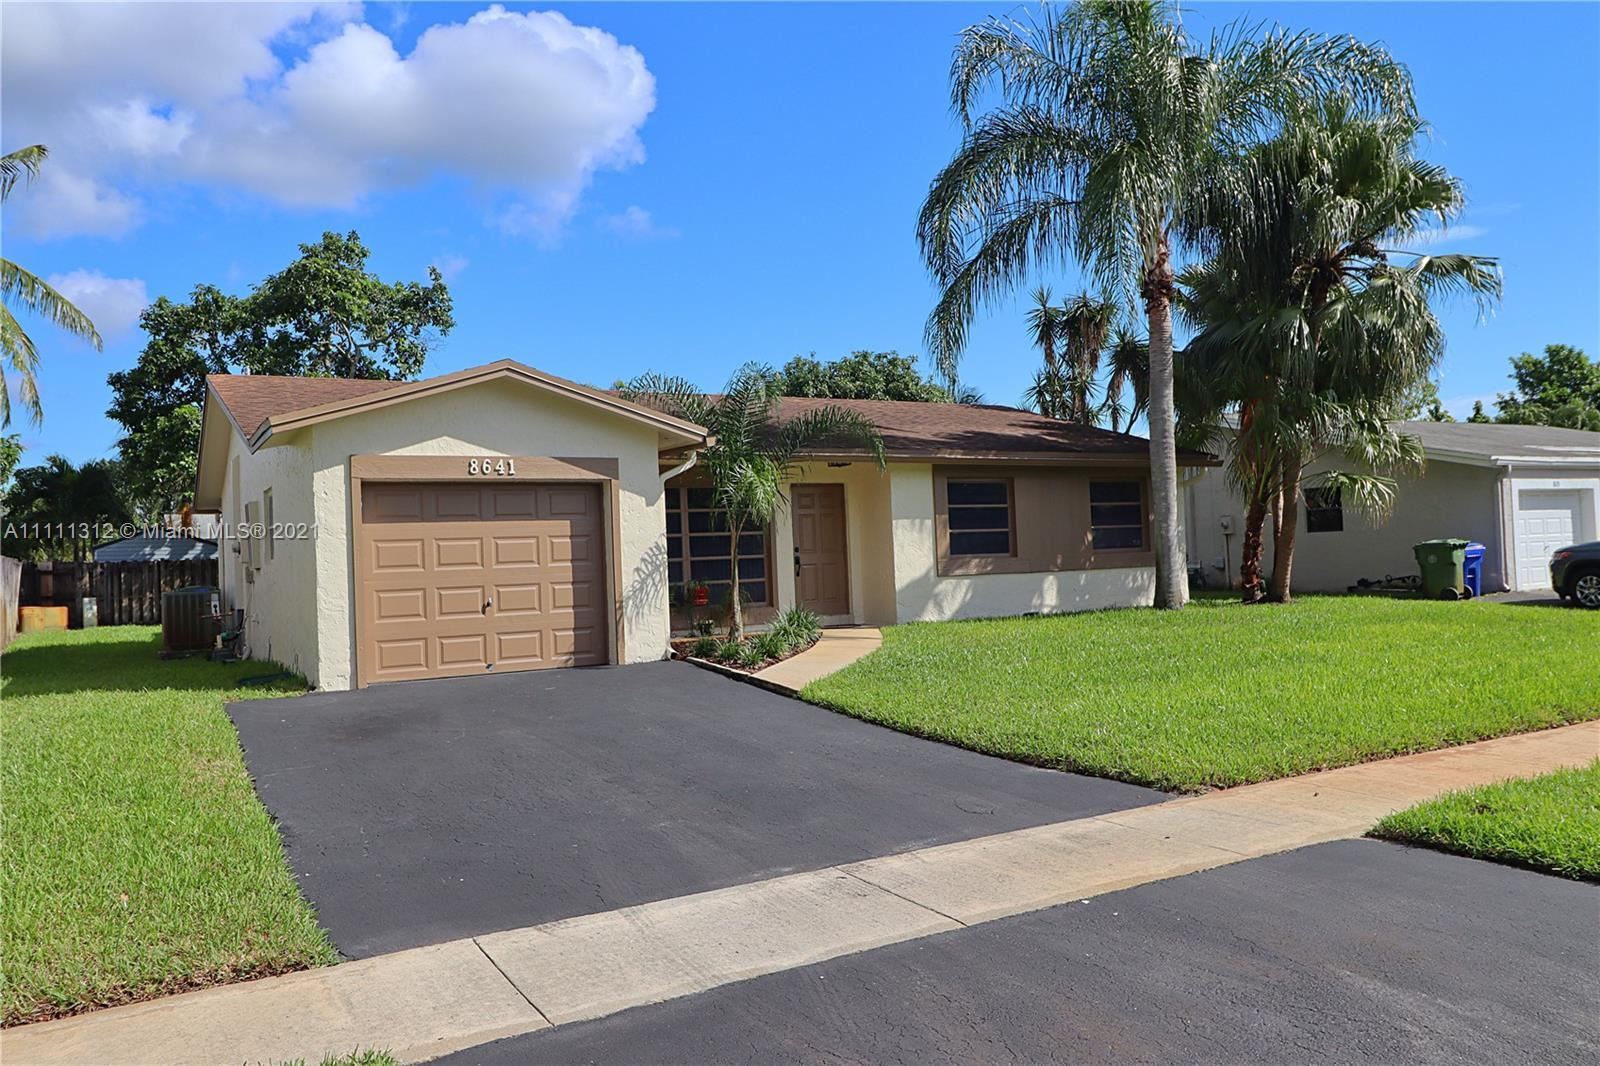 Photo of 8641 NW 8th St, Pembroke Pines, FL 33024 (MLS # A11111312)